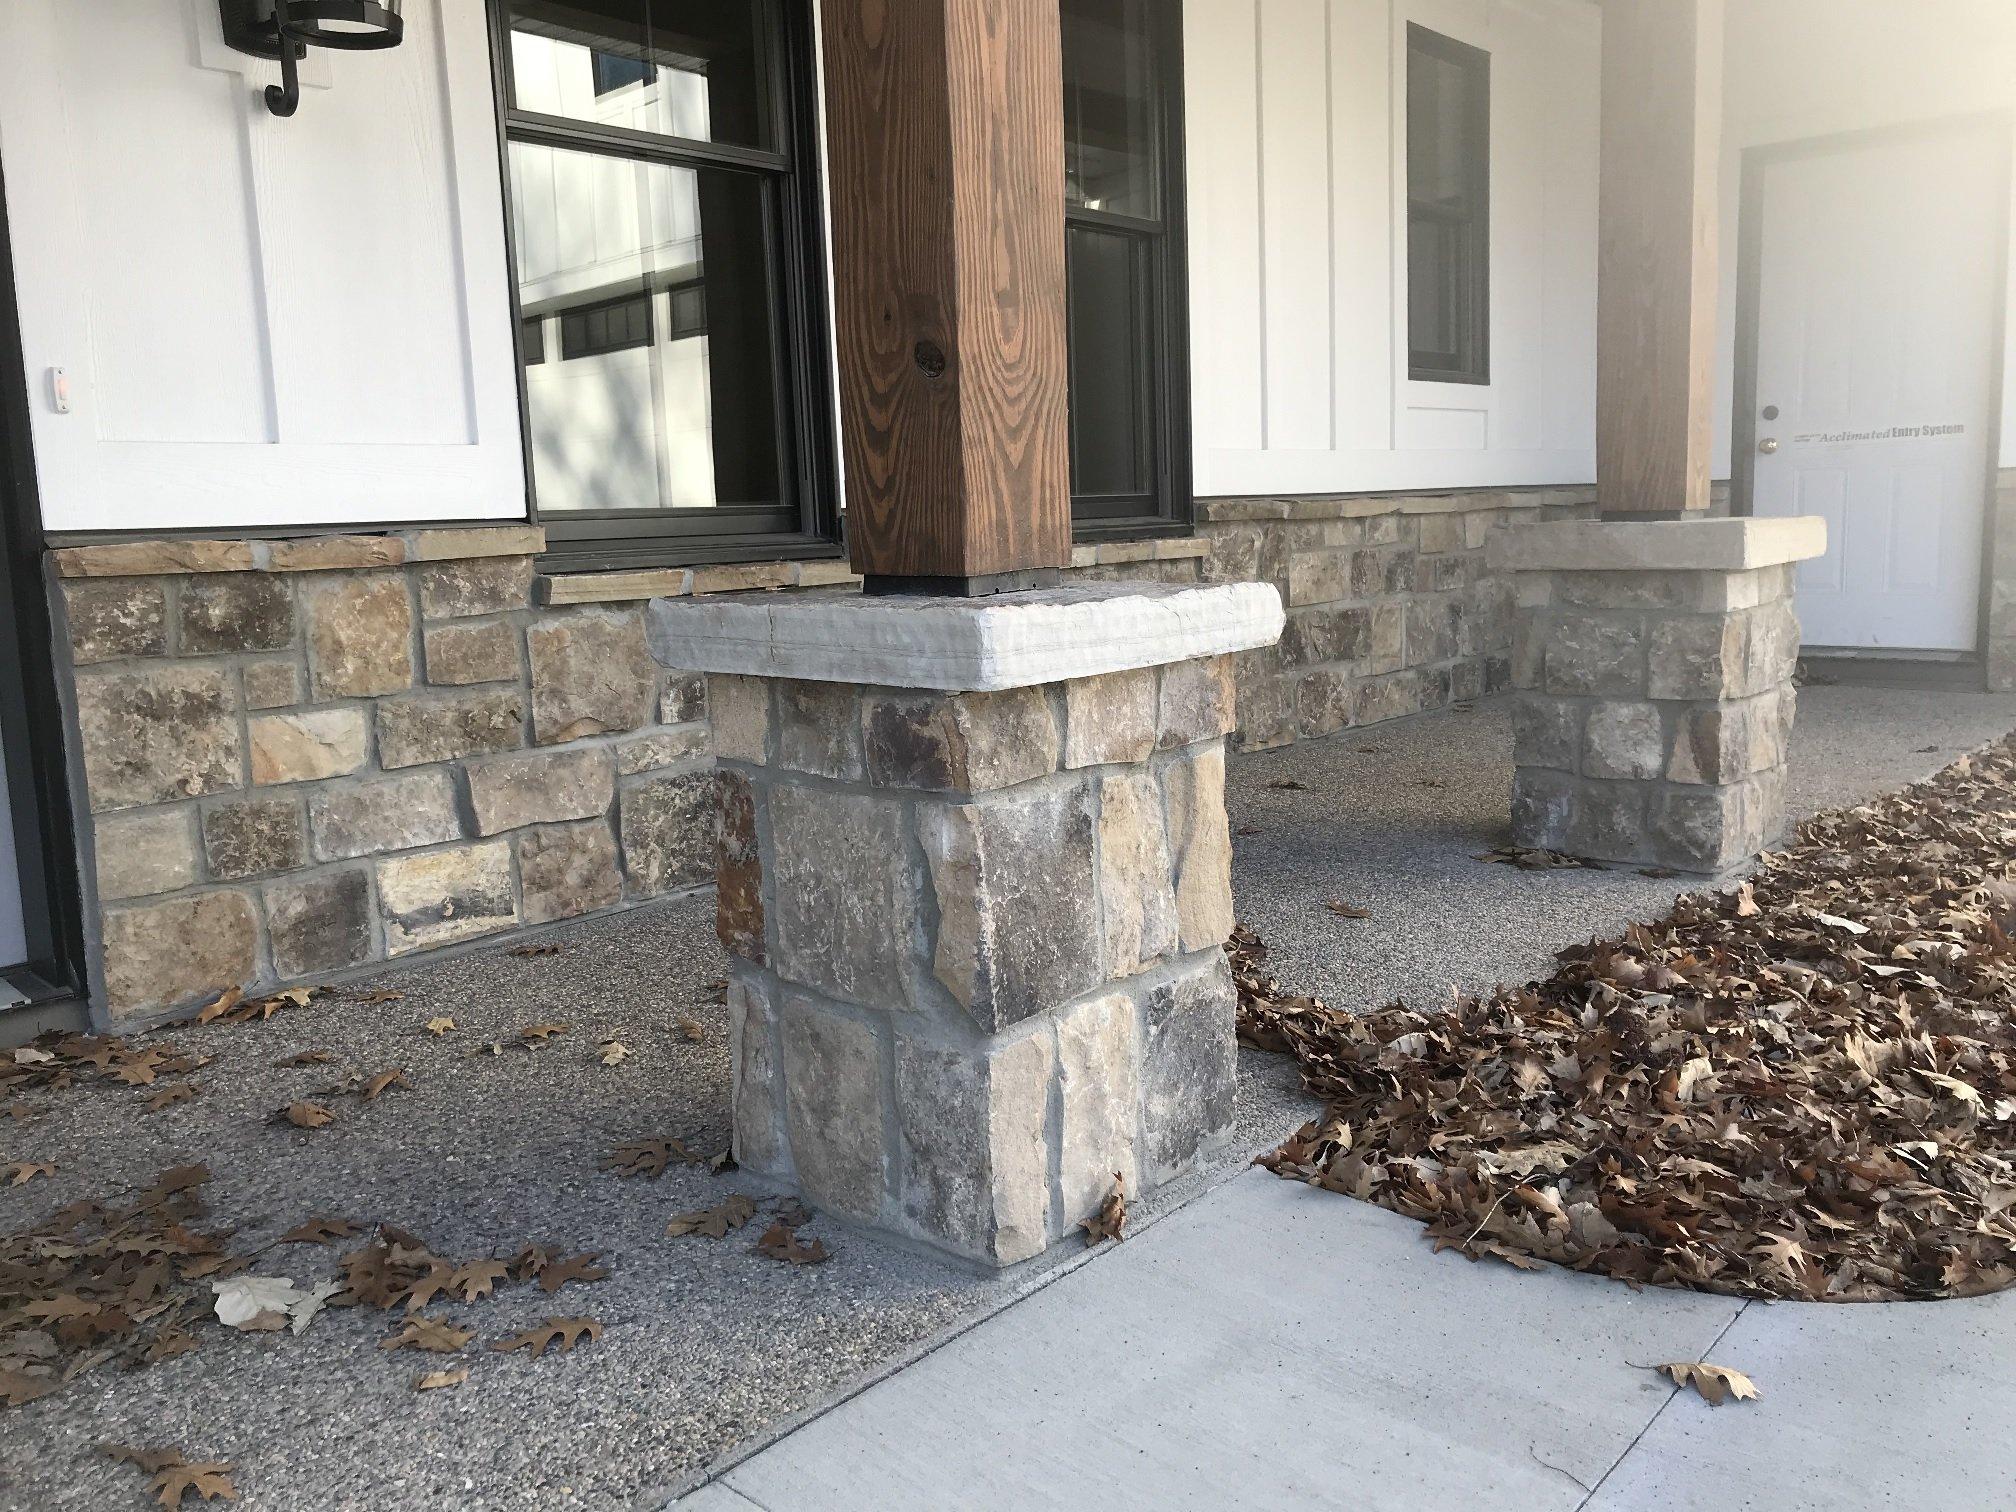 Whistler Real Thin Stone Veneer Wainscoting and Pillars